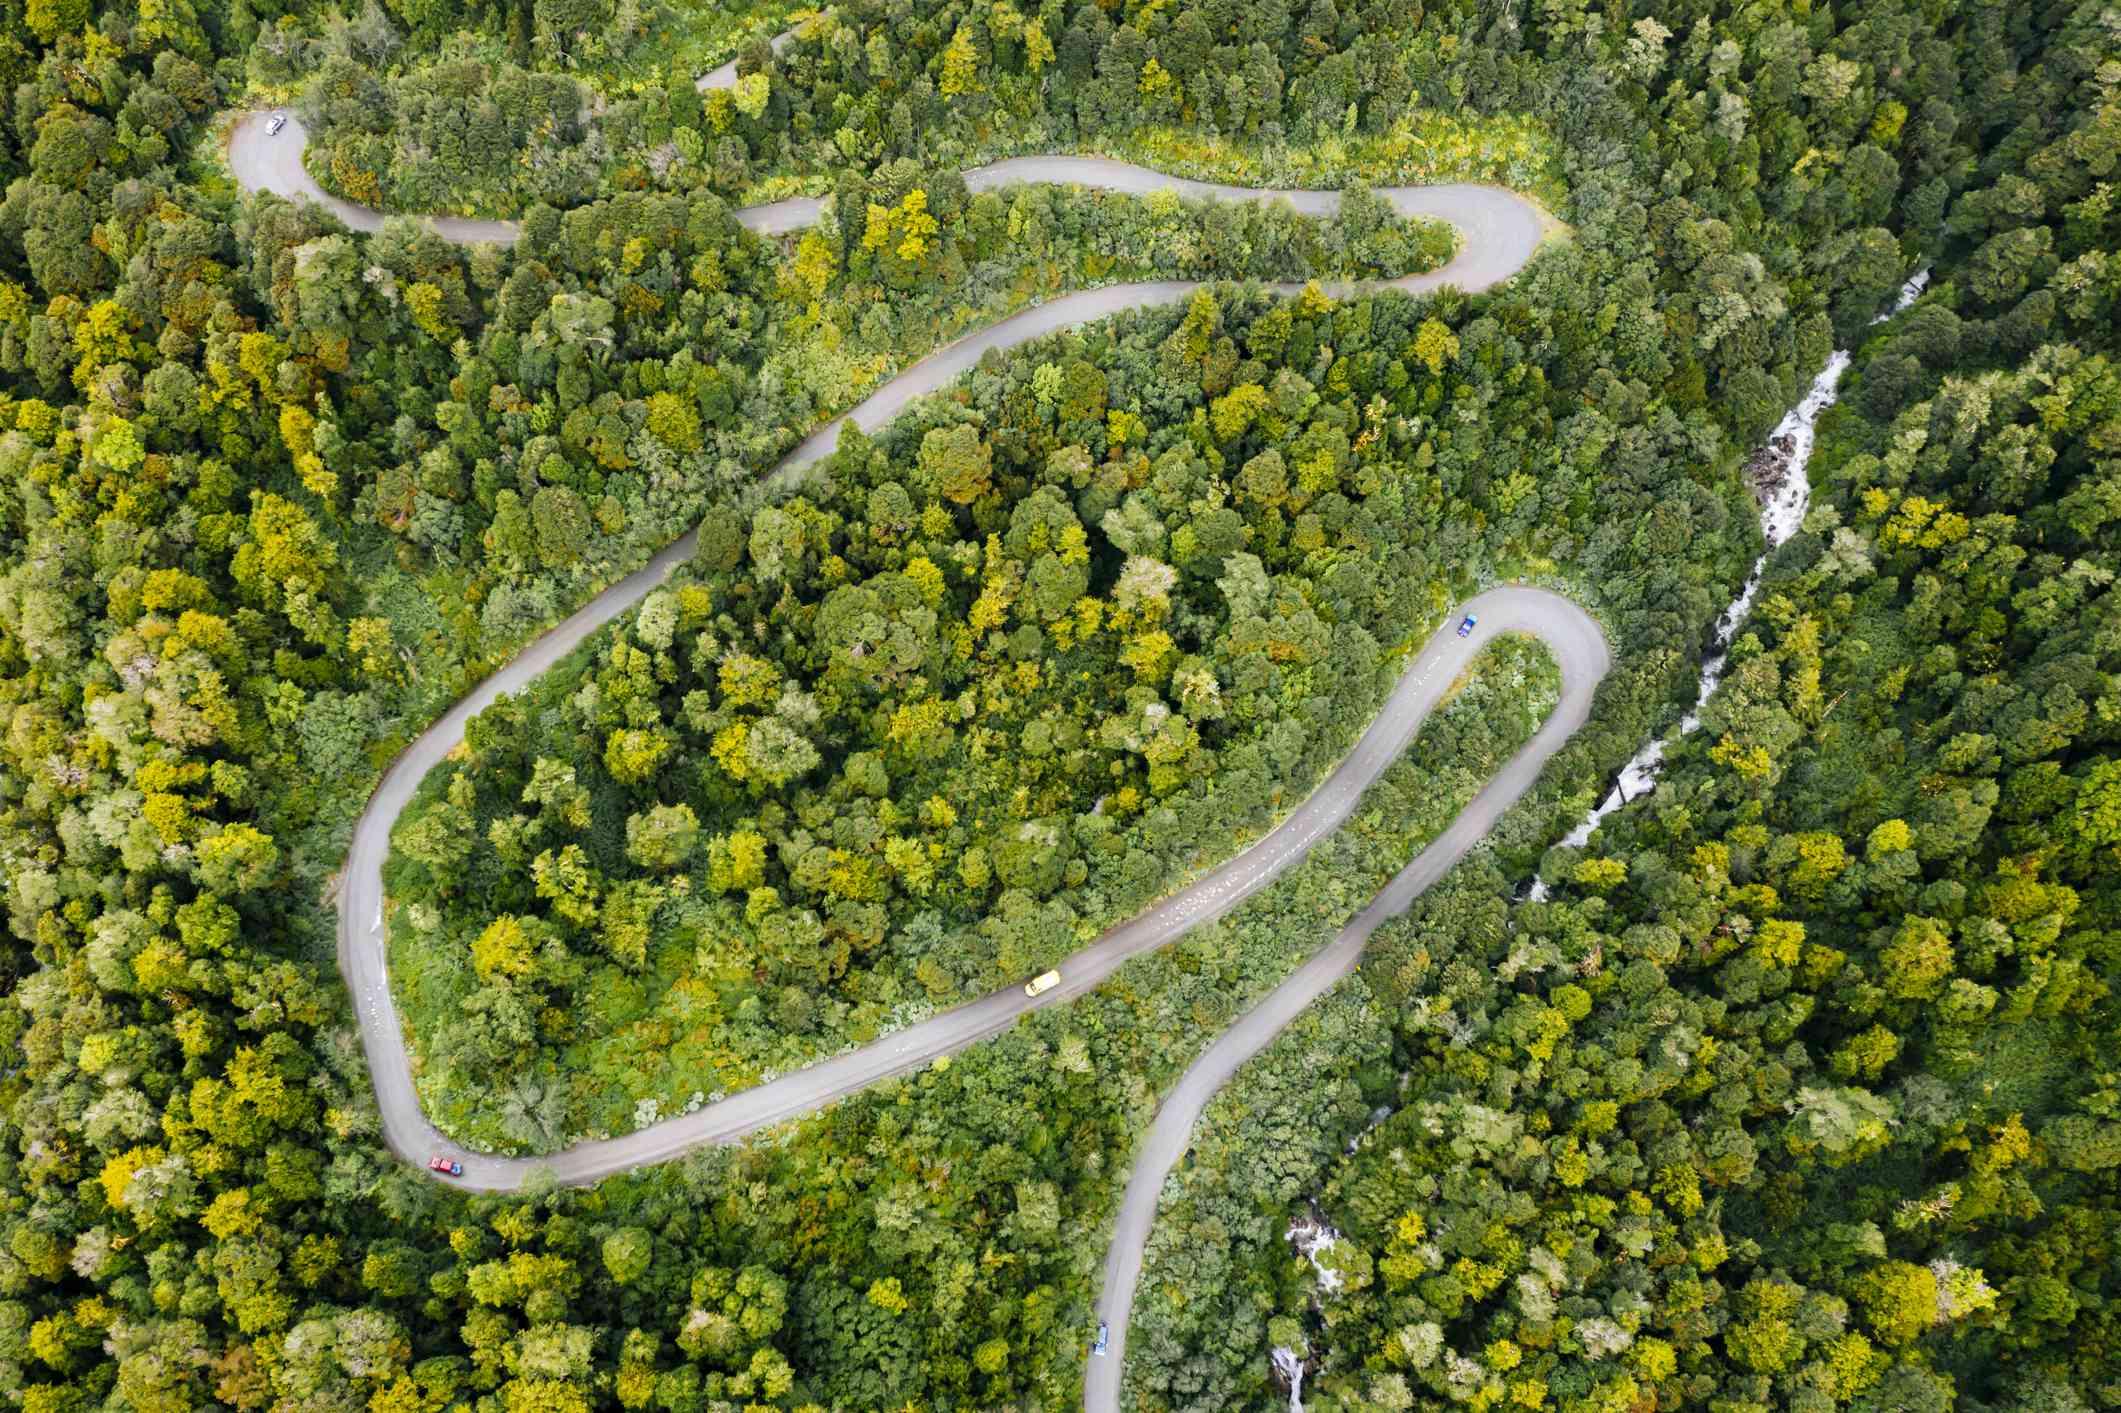 Twisted road of the Carretera Austral in Parque Nacional Queulat